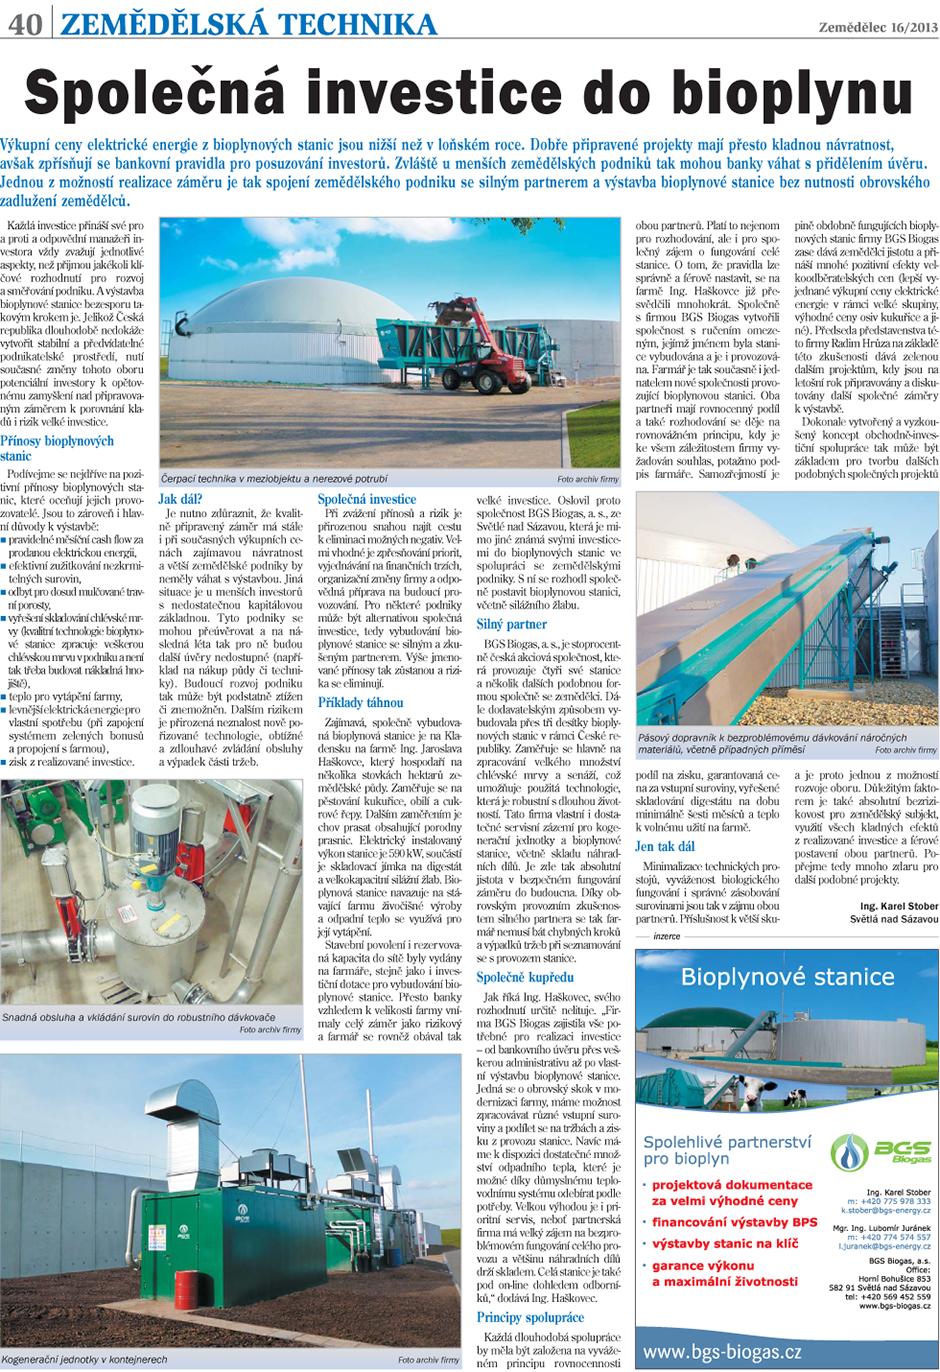 BGS-Biogas-Spolecna-investice-do-bioplynu